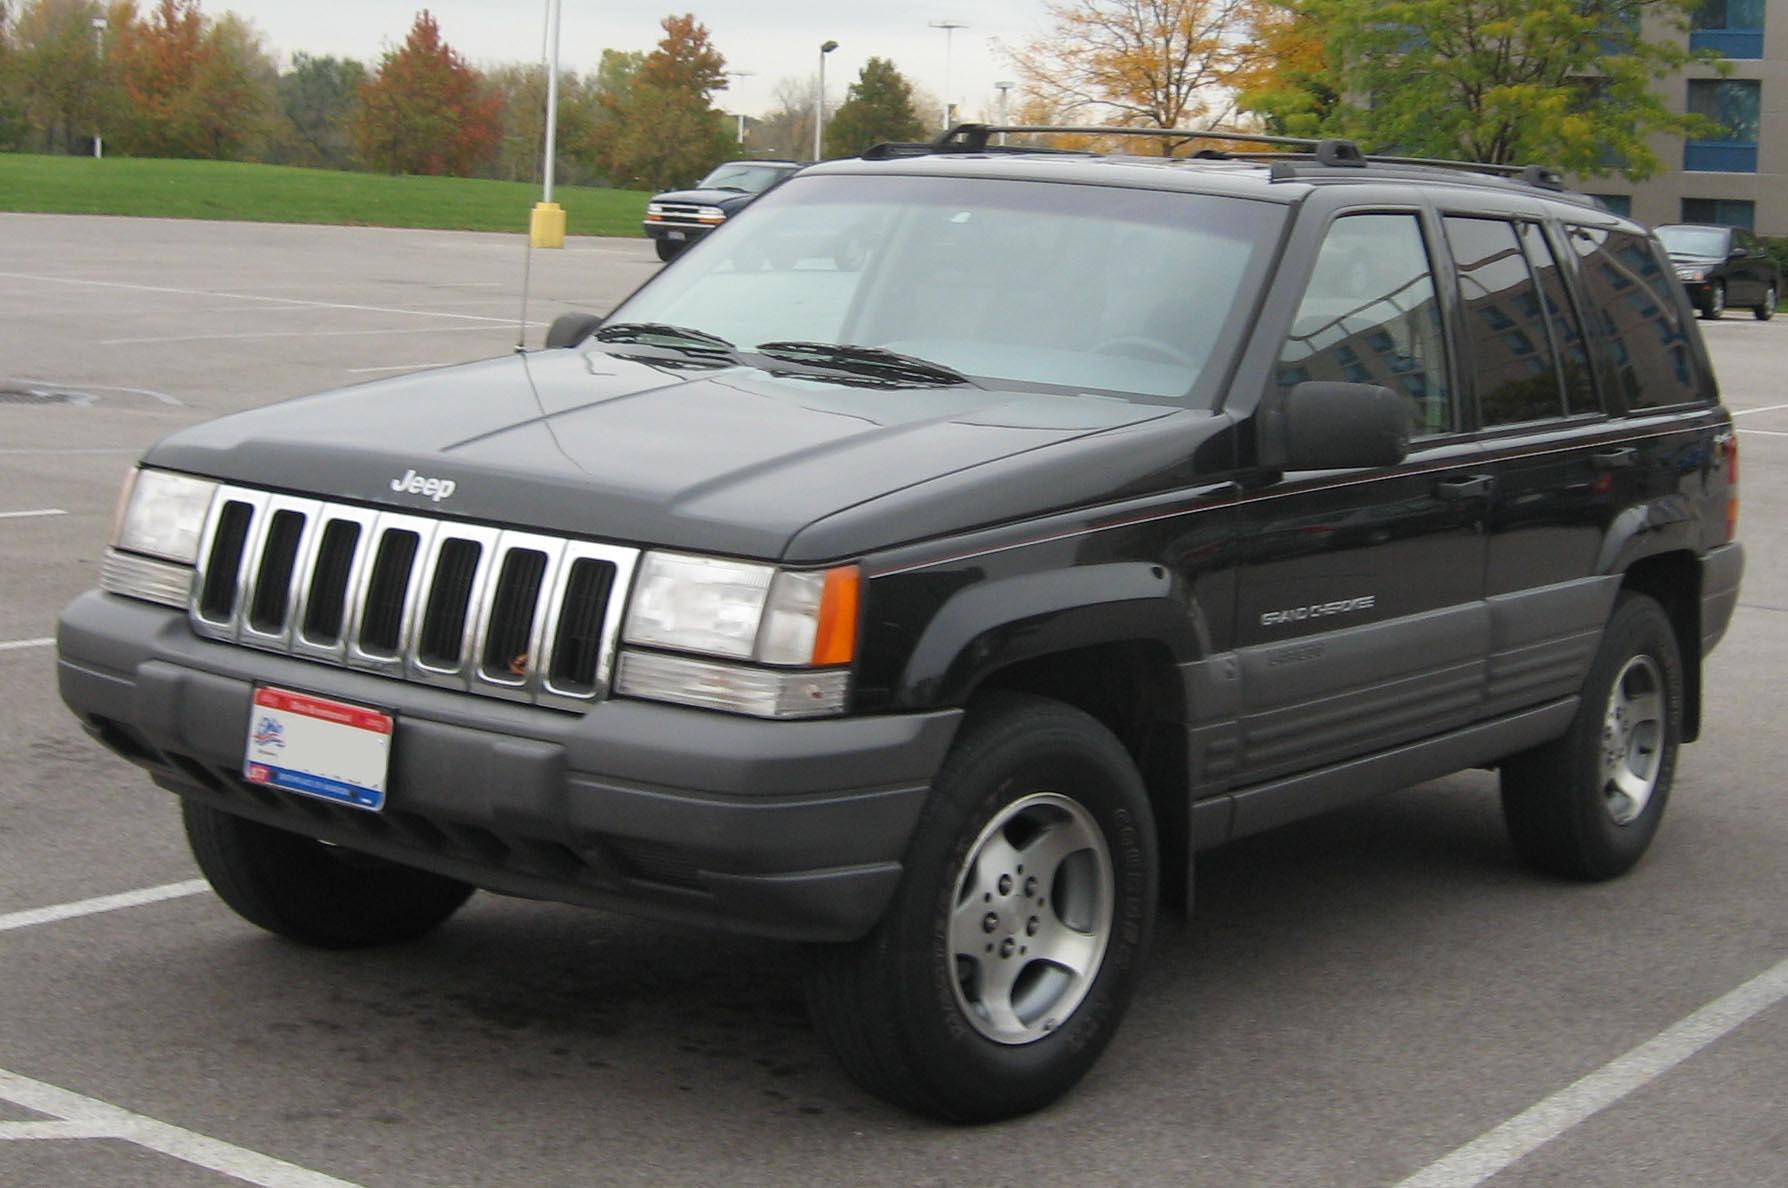 Ficheiro:1st Jeep Grand Cherokee